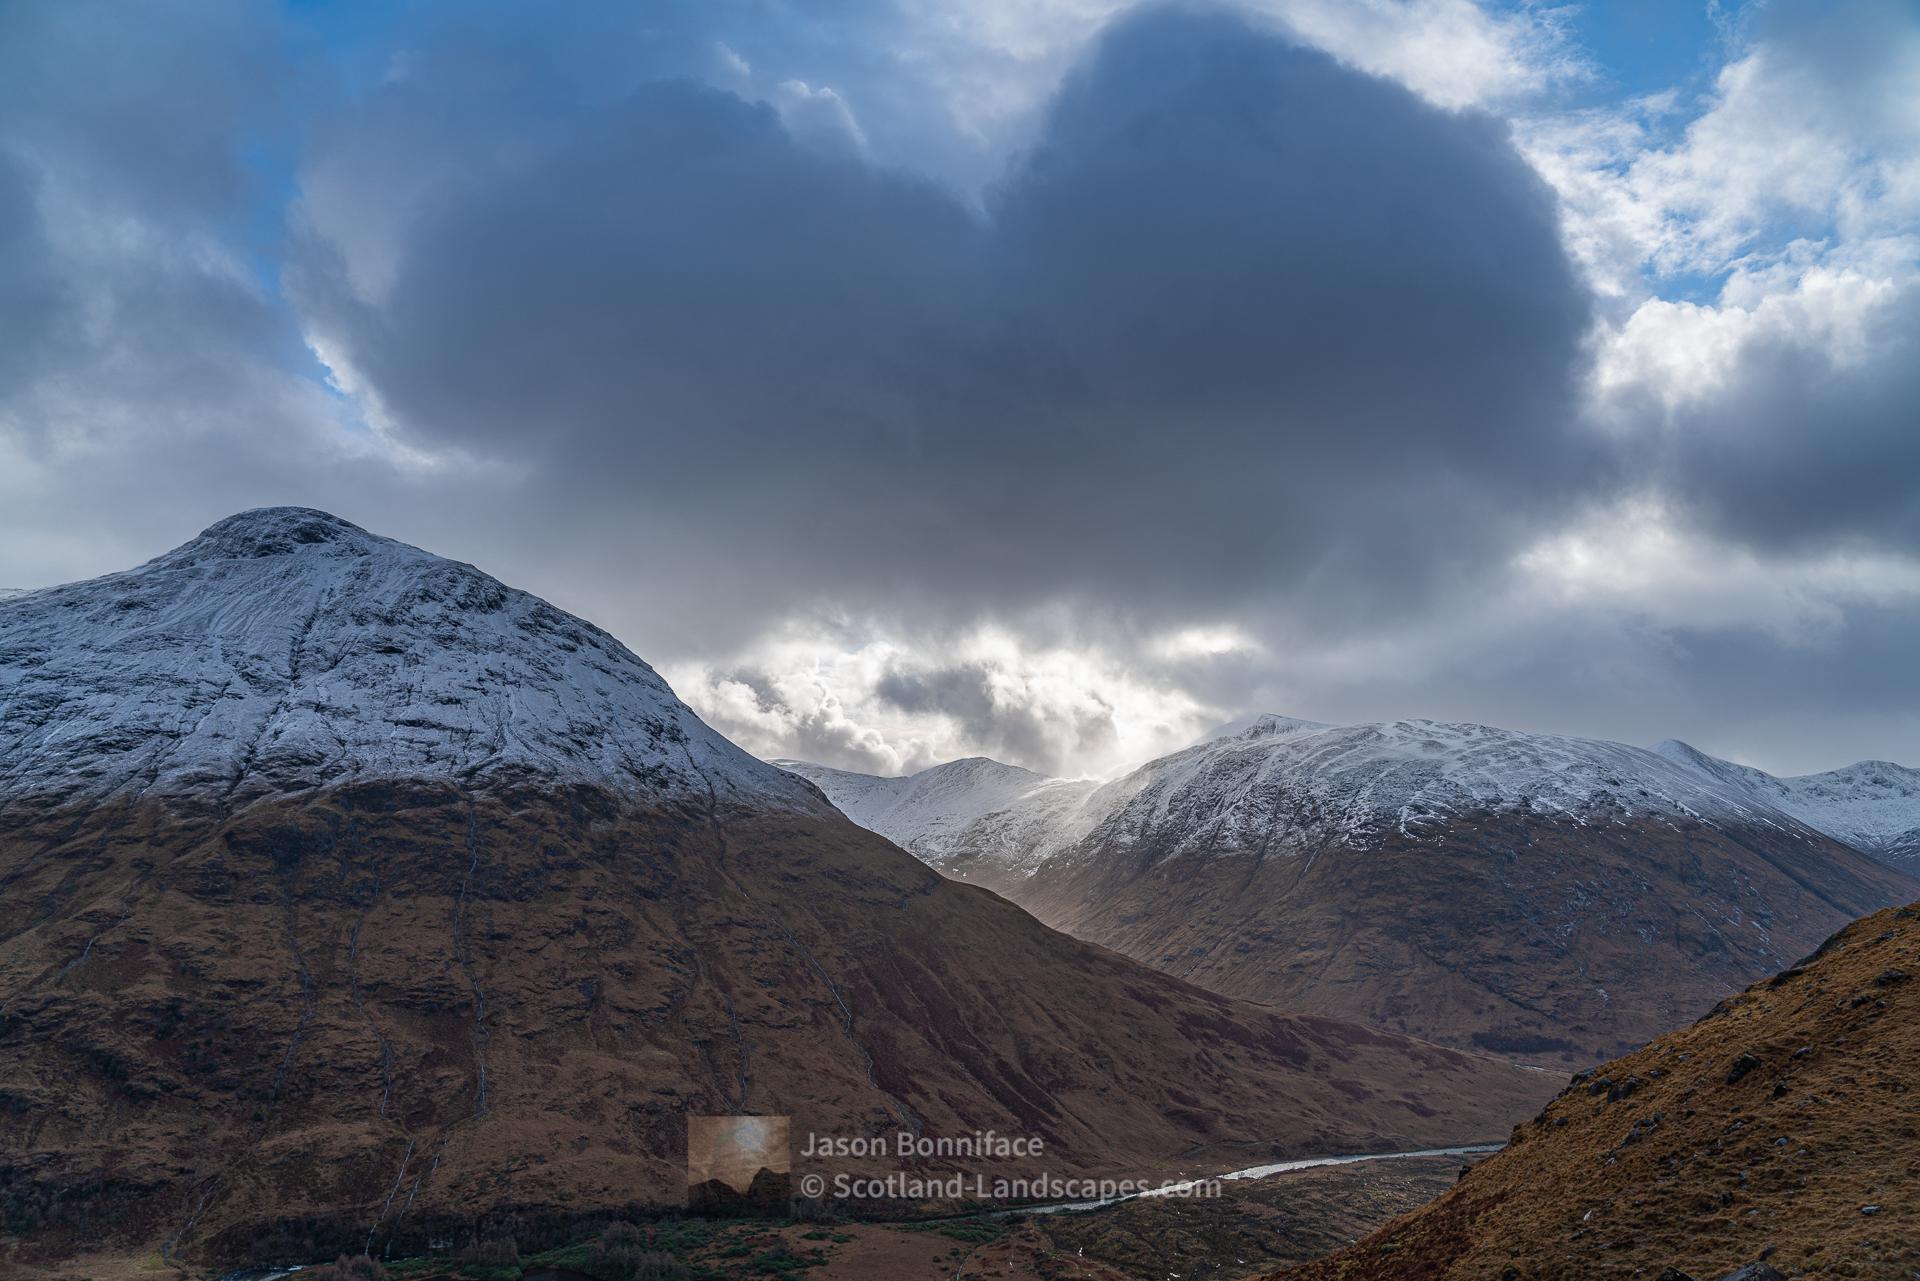 Stob Dubh and Stob Coir' an Albannaich on the east side of Glen Etive from Creag na Caillich